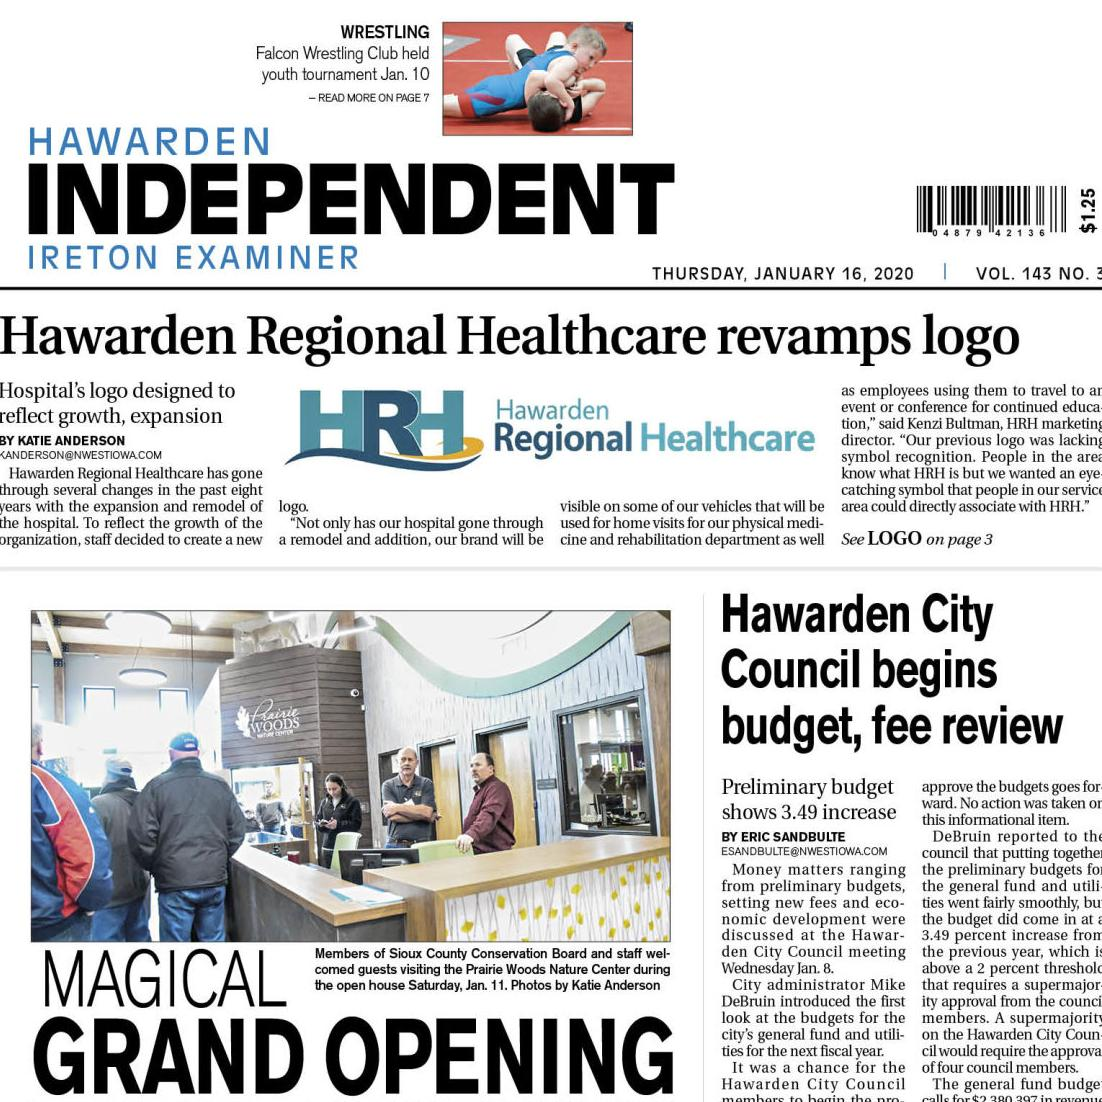 Hawarden Independent/Ireton Examiner Jan. 18, 2020